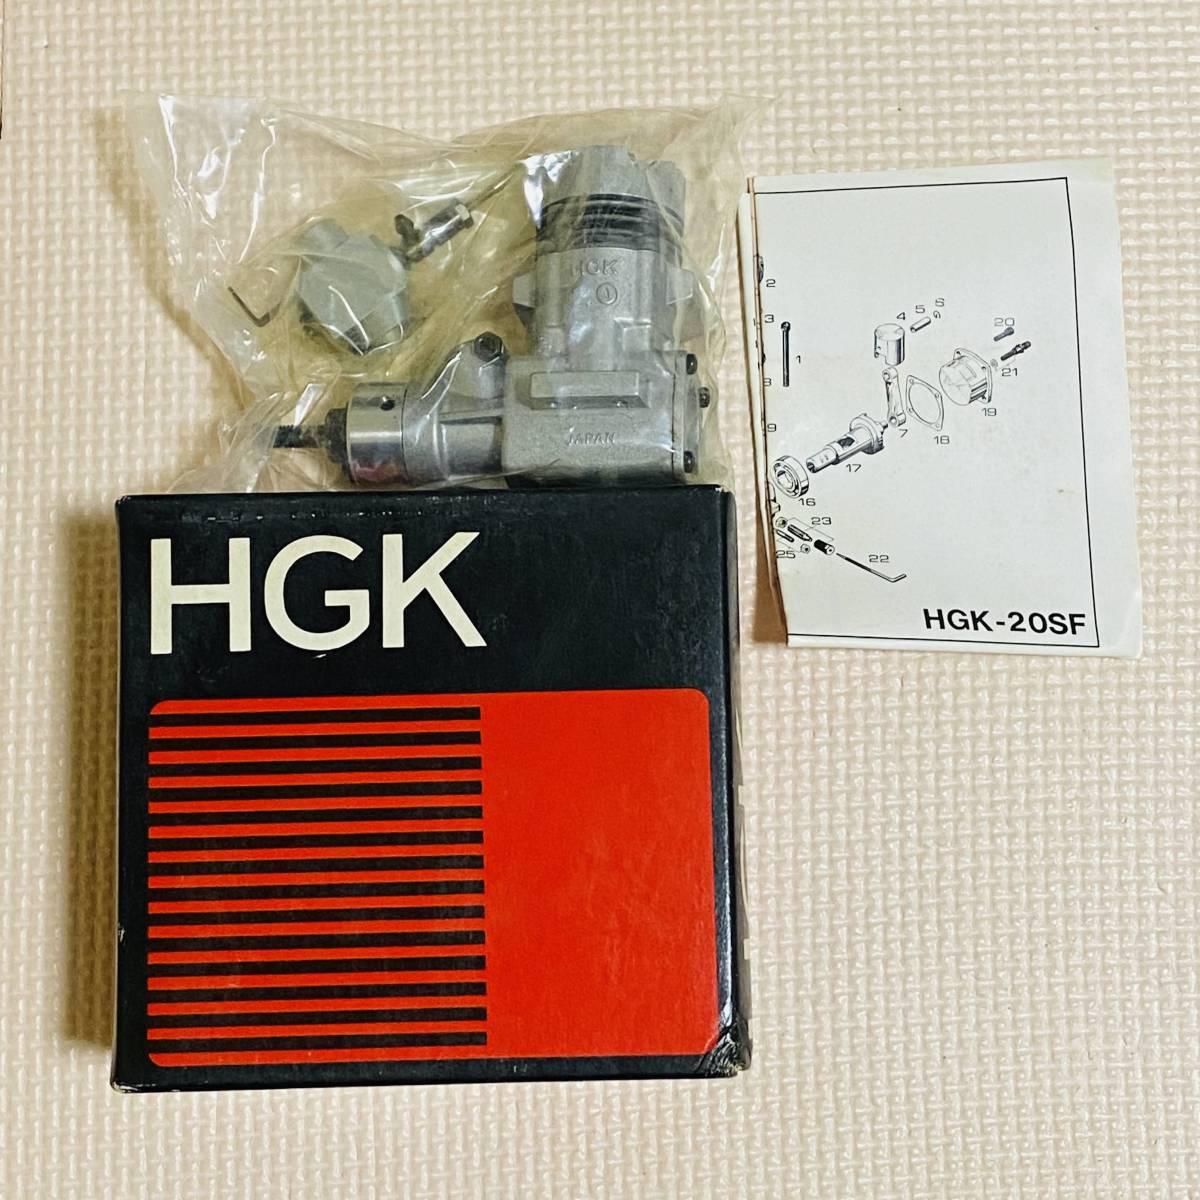 HGK 20 SF ラジコン エンジン 新品 未使用 ビンテージ 橋岡技研研究所 デットストック ★ 送料無料